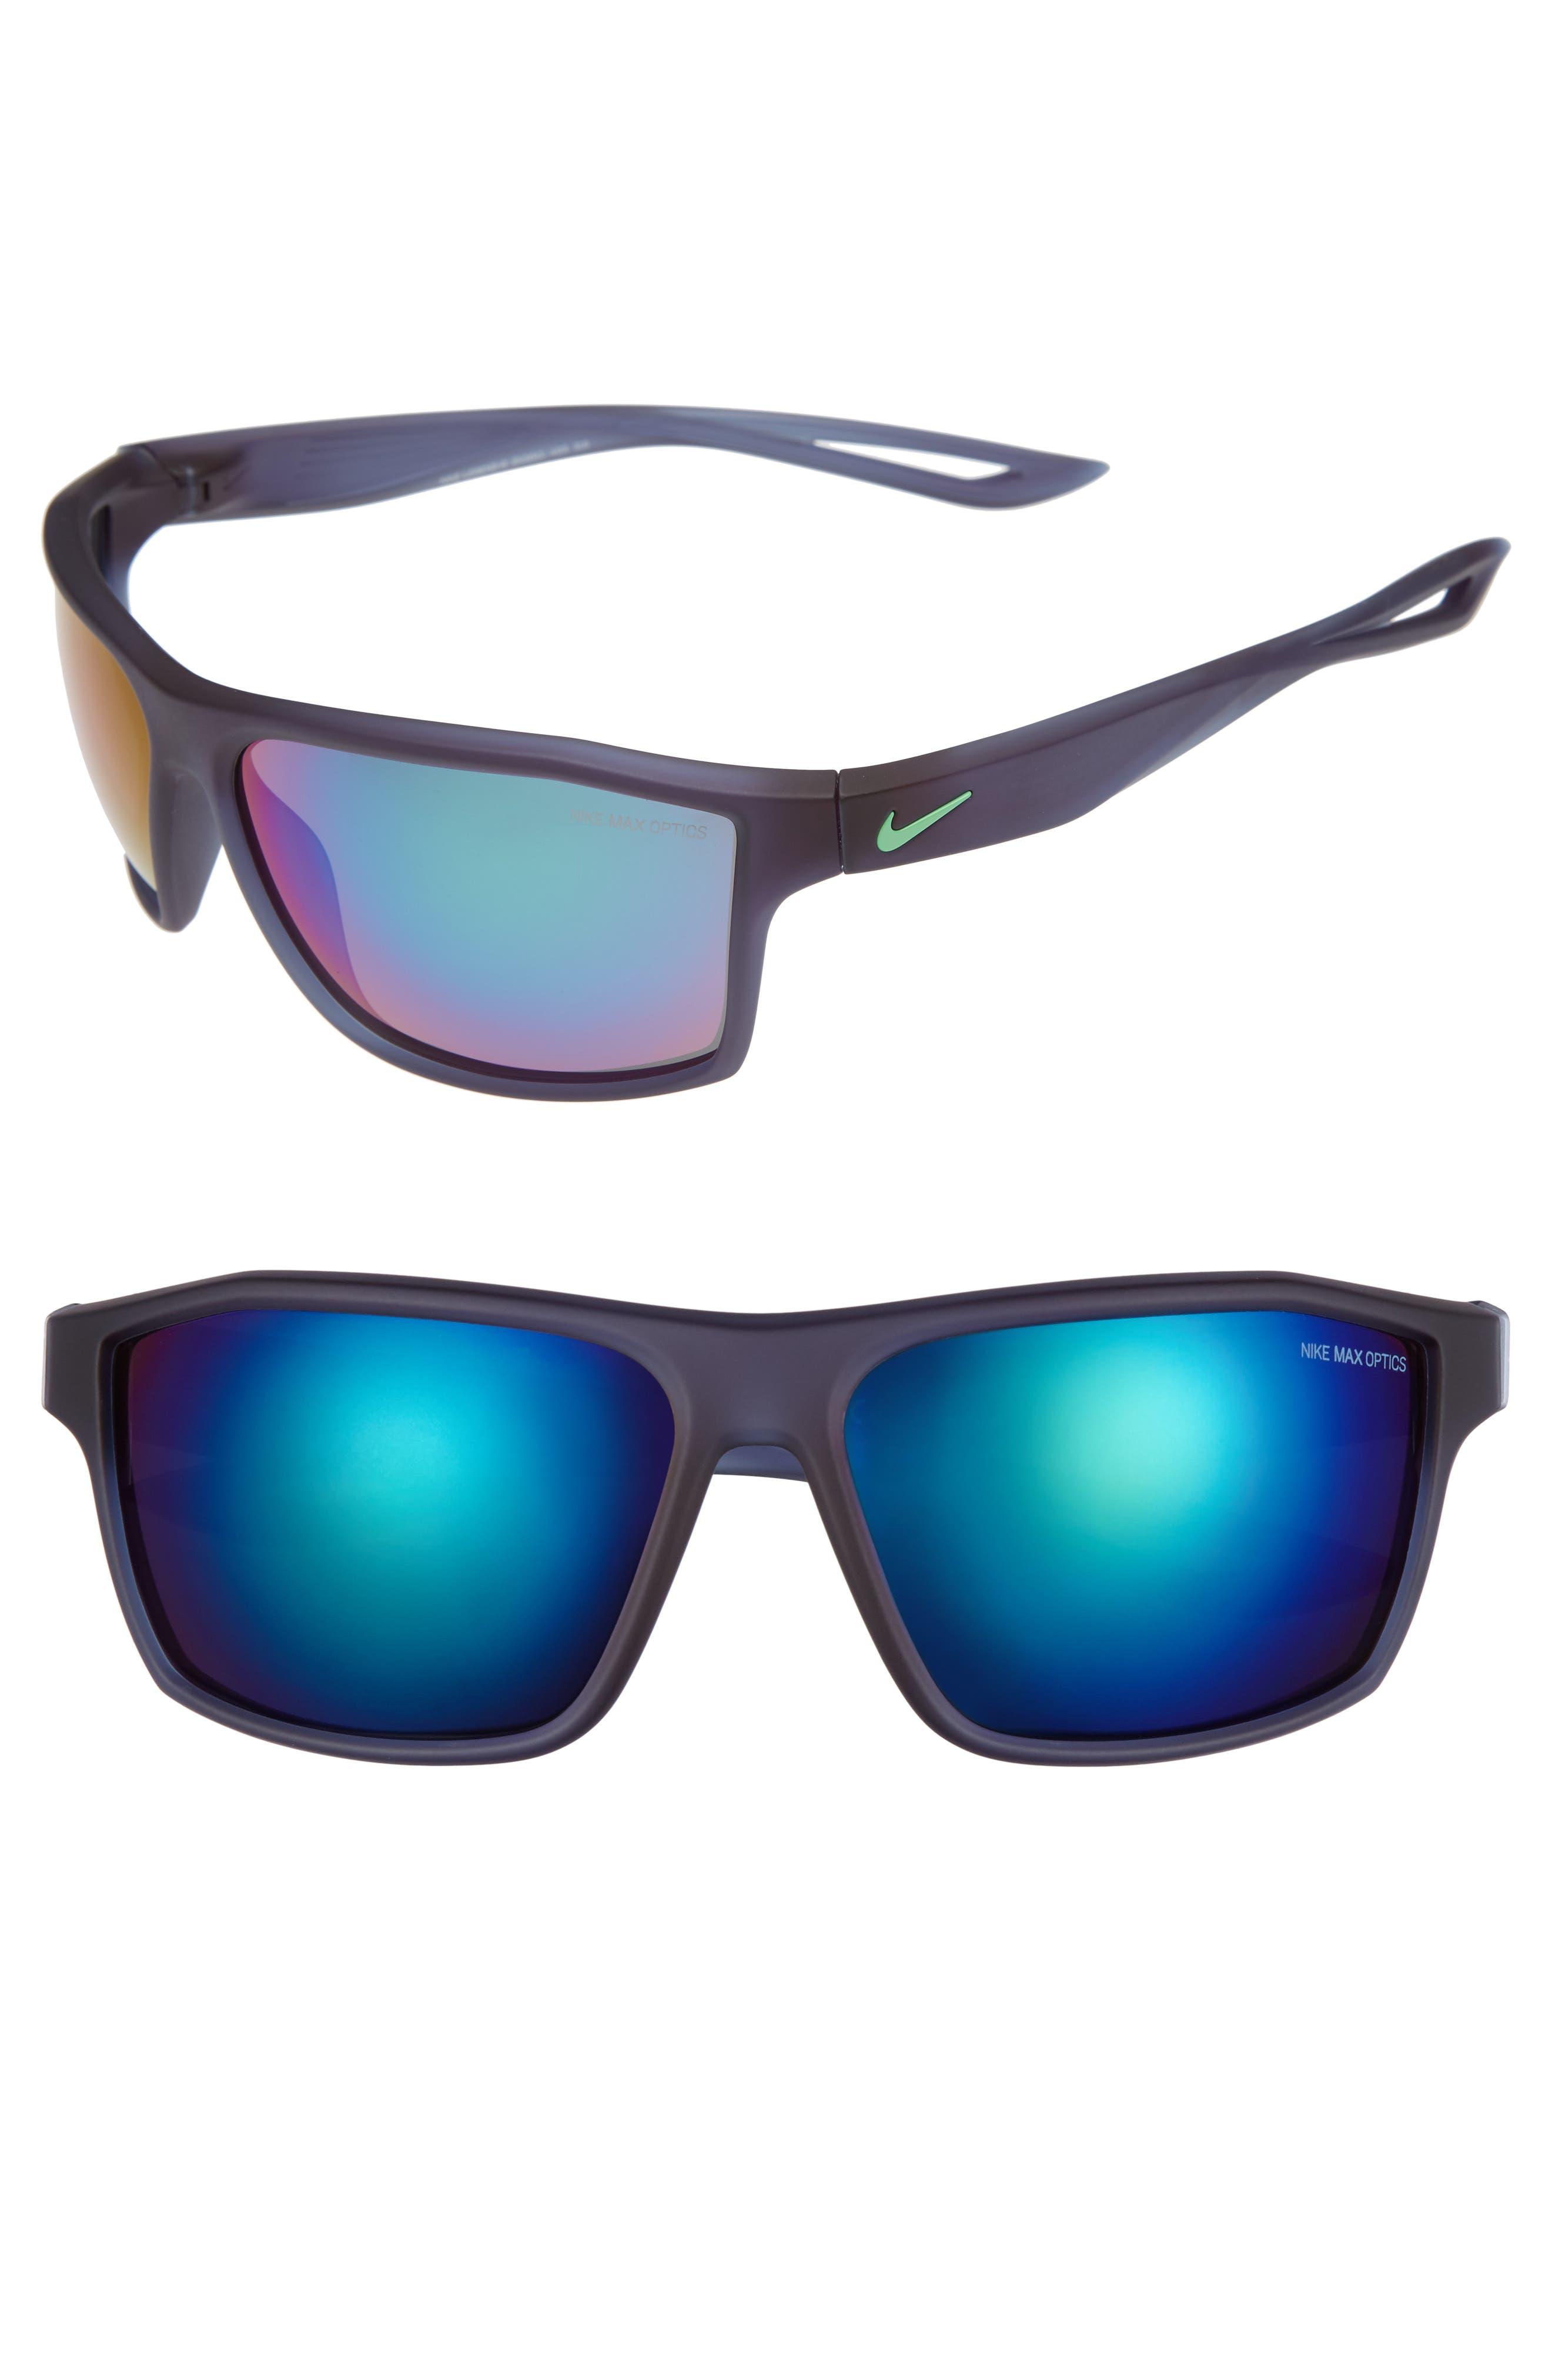 Alternate Image 1 Selected - Nike Legend 65mm Mirrored Multi-Sport Sunglasses